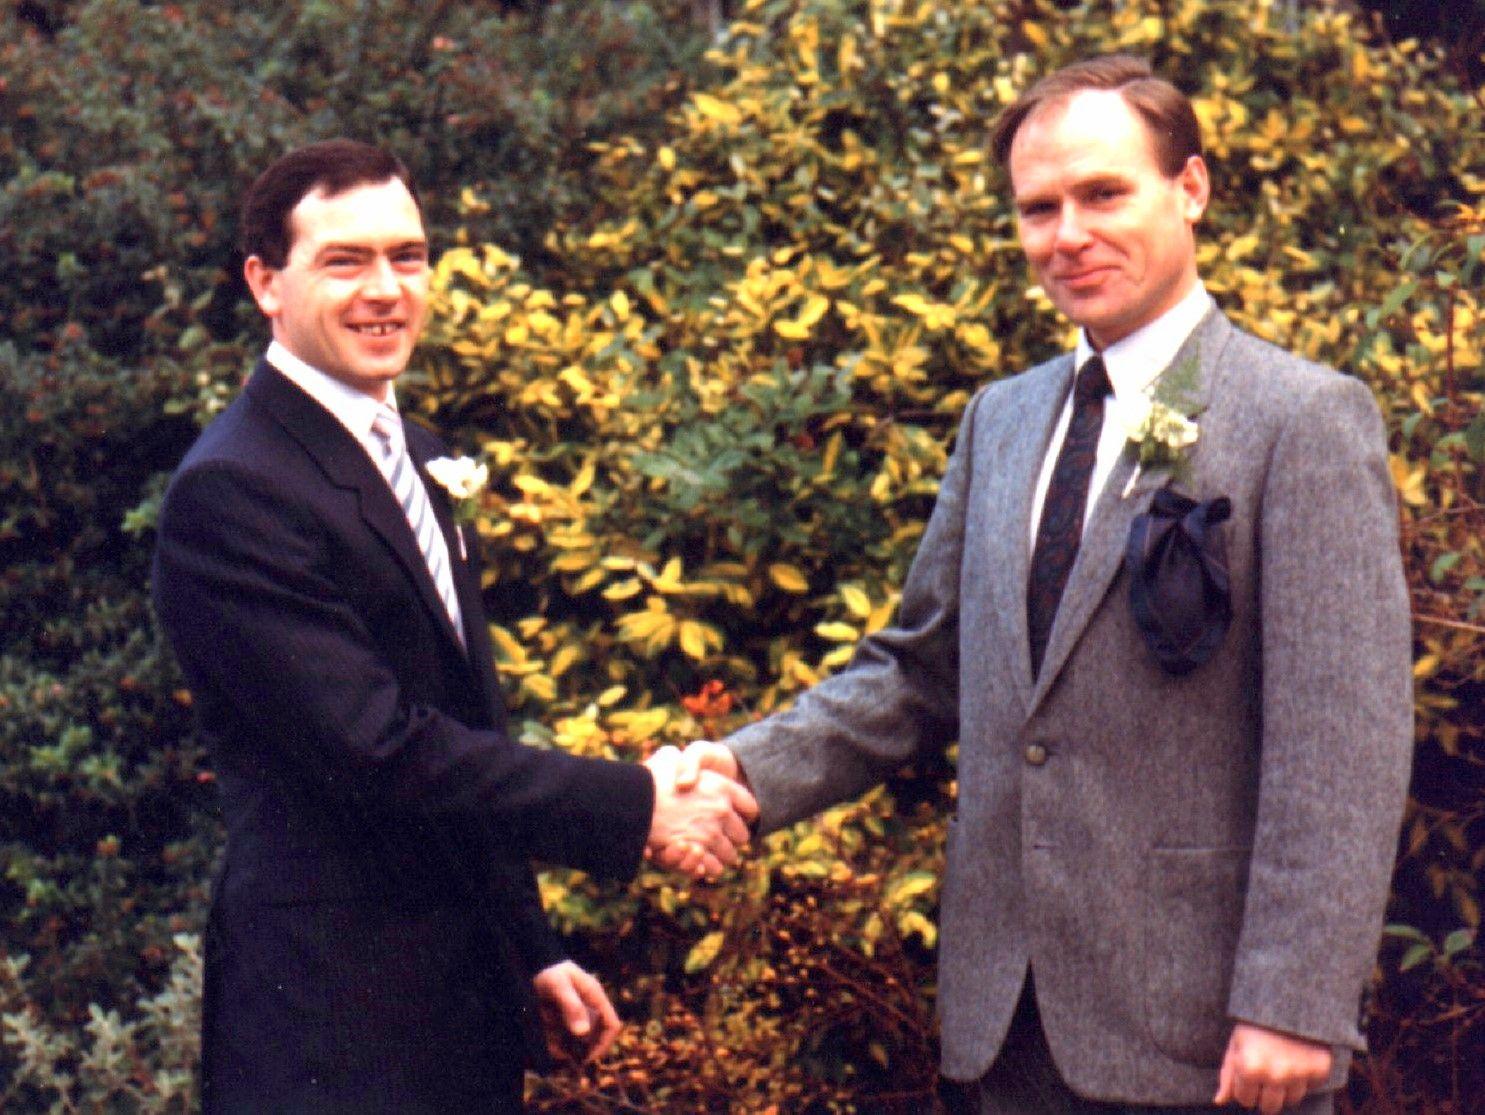 Brian & Robert Bovington (Brian's wedding) Suit jacket